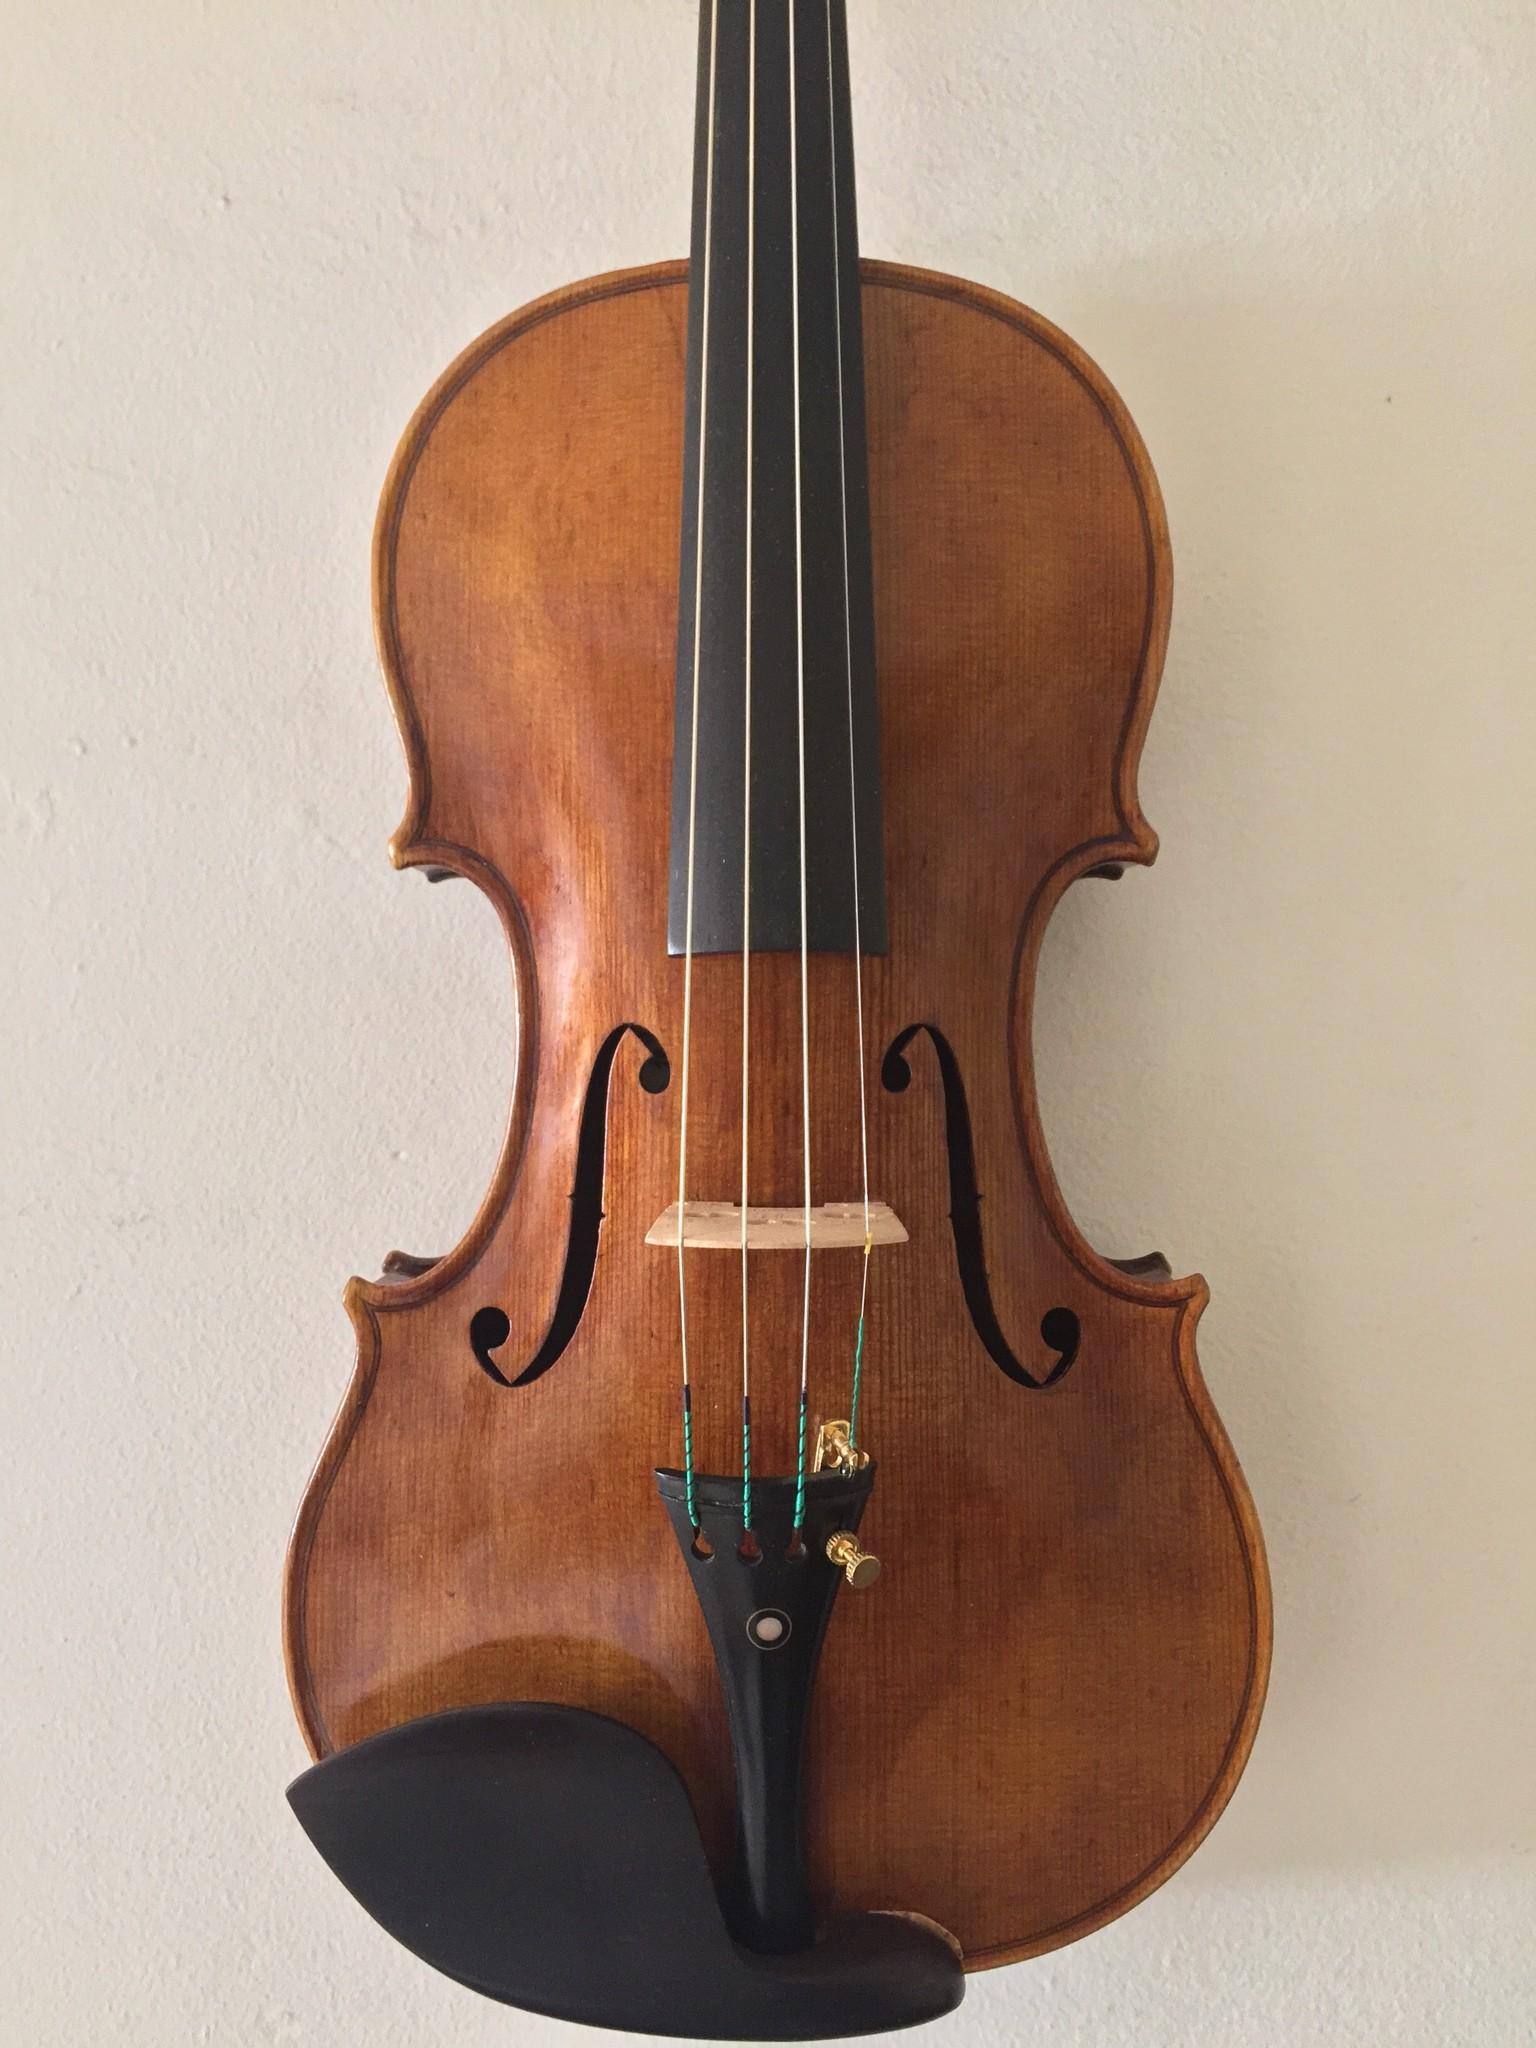 James Ropp violin, 2018, J14-G, Spokane, Washington, USA